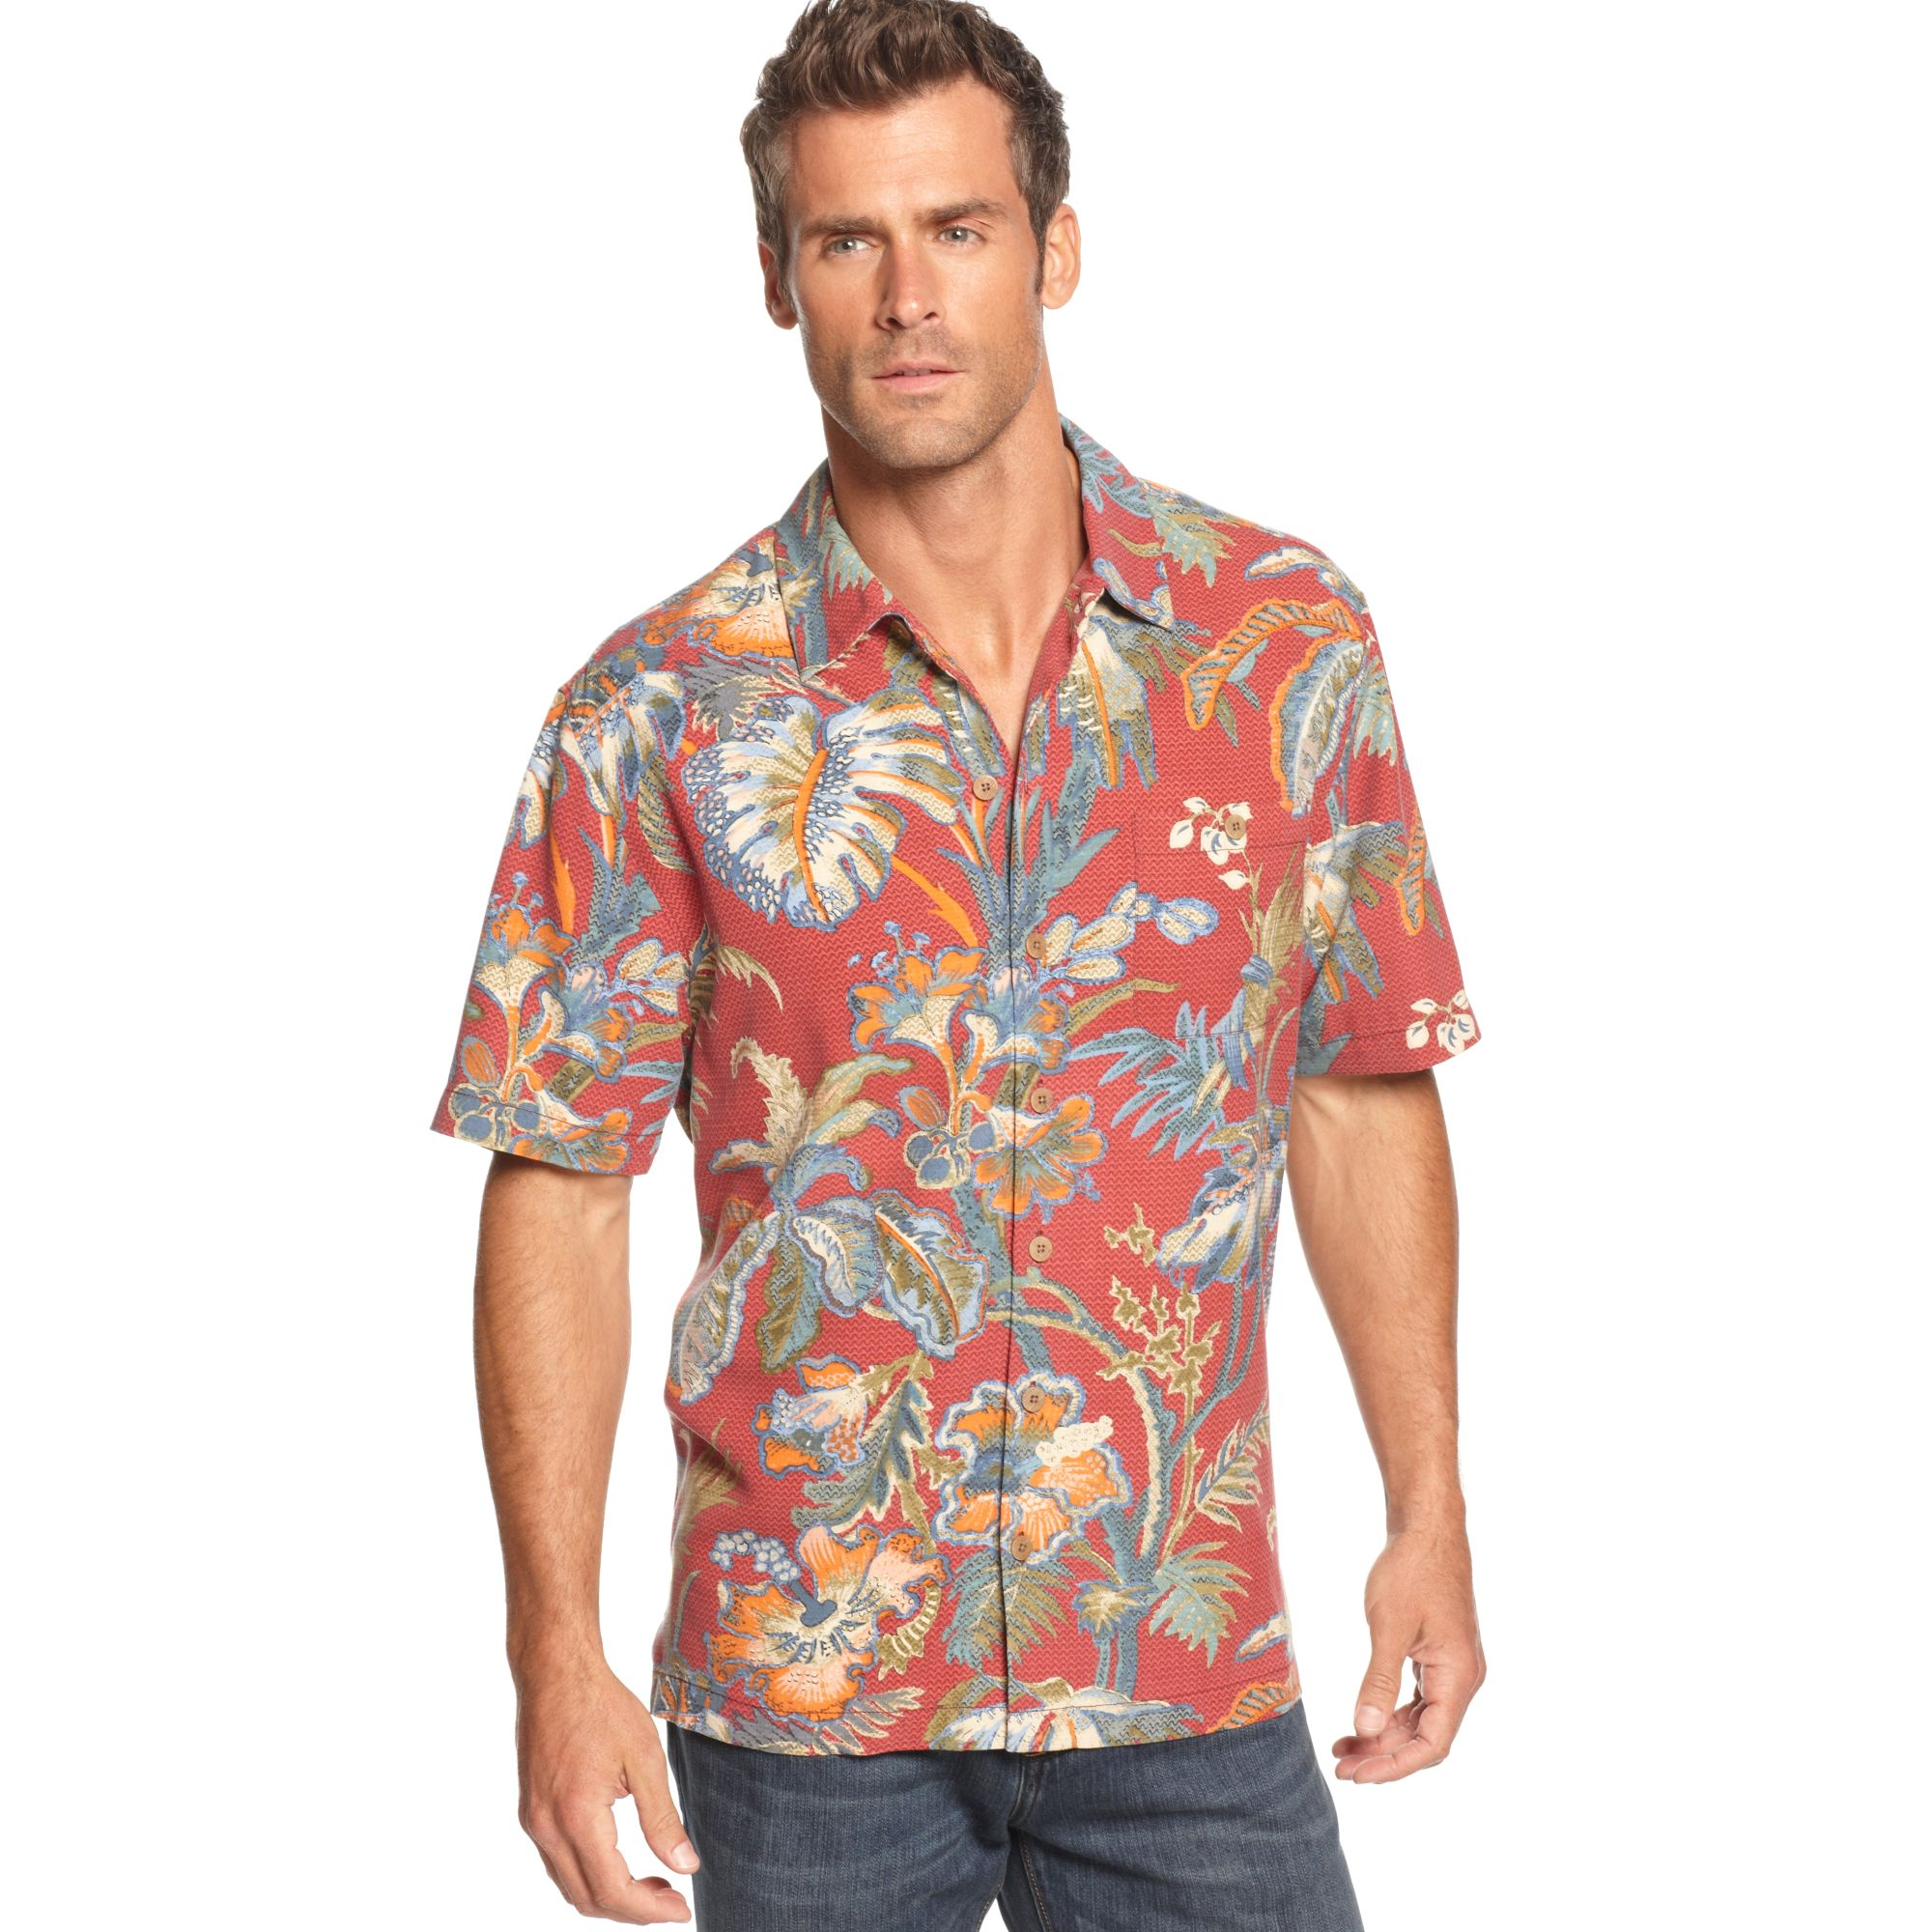 Tommy bahama short sleeve laurel floral shirt for men lyst for Tommy bahama florida shirt